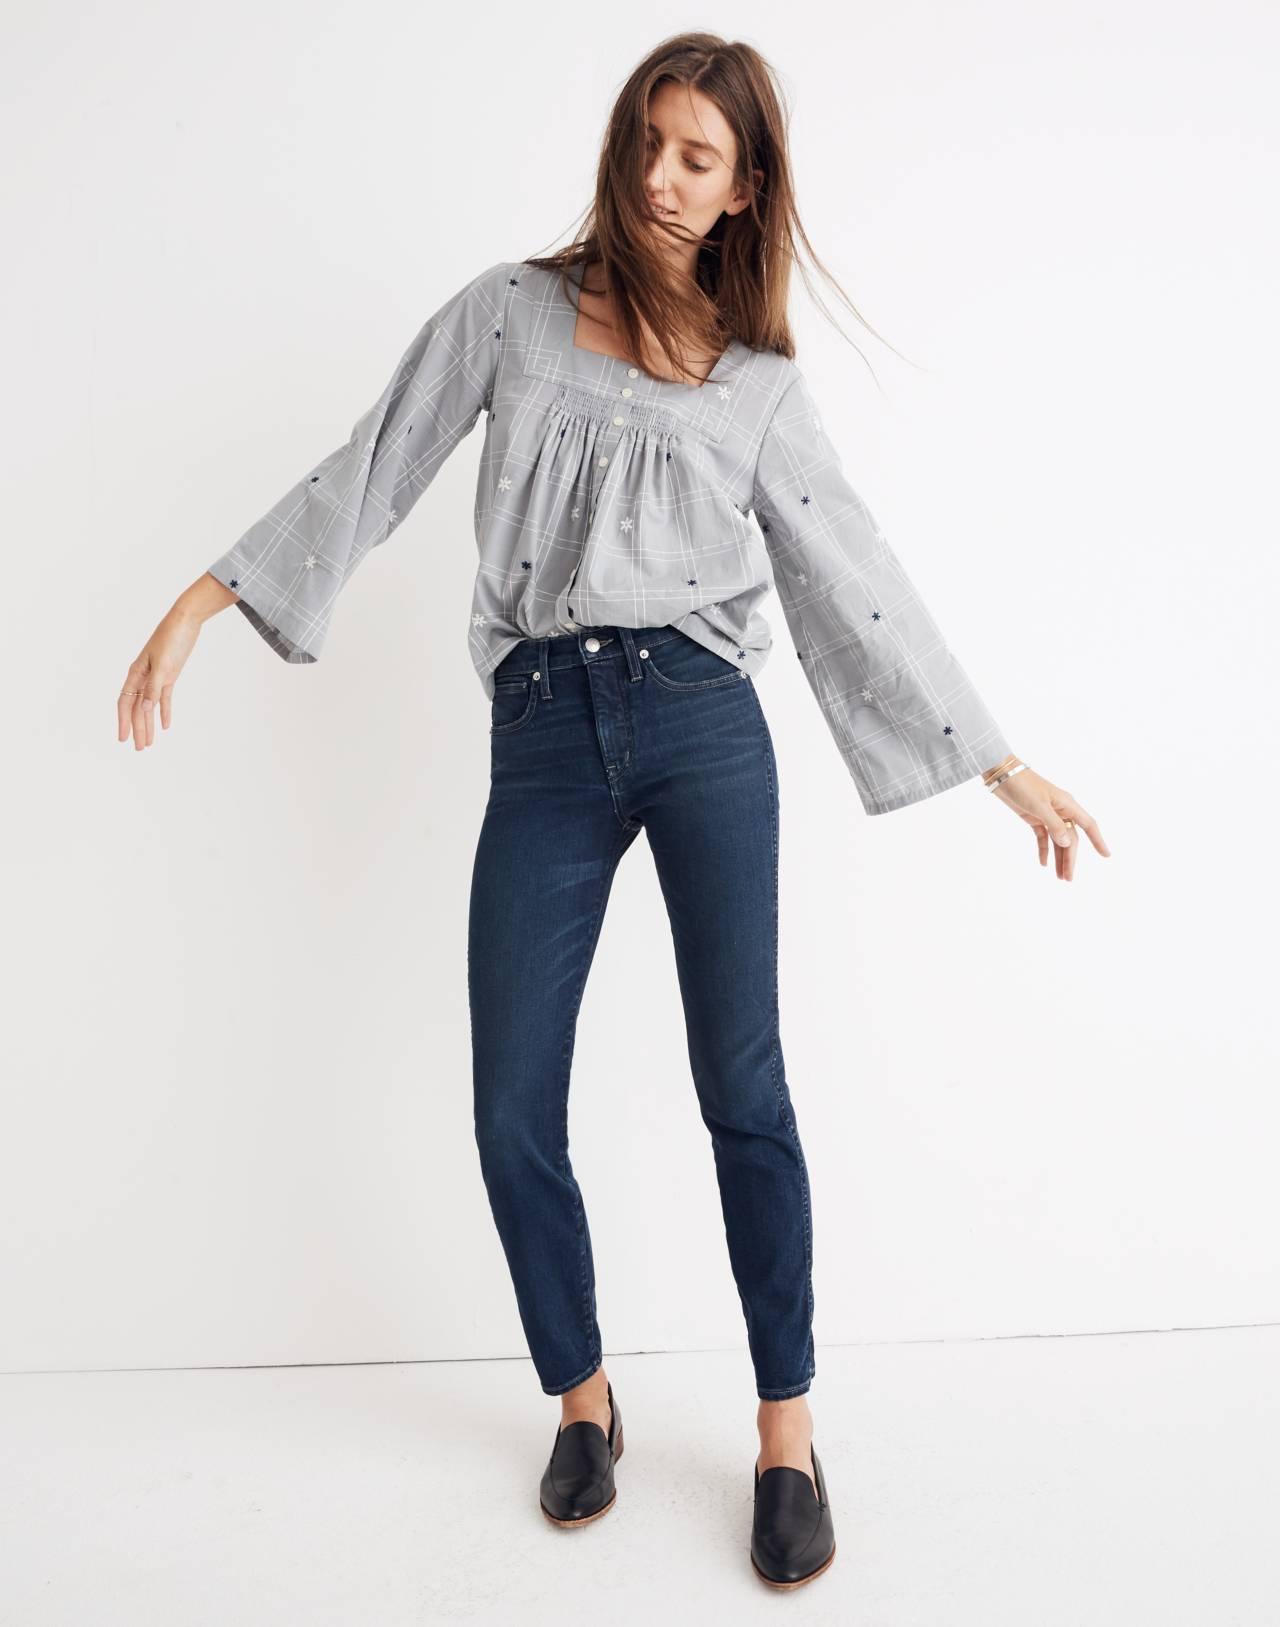 Rivet & Thread Slim Straight Jeans in Richardson Wash in richardson wash image 1